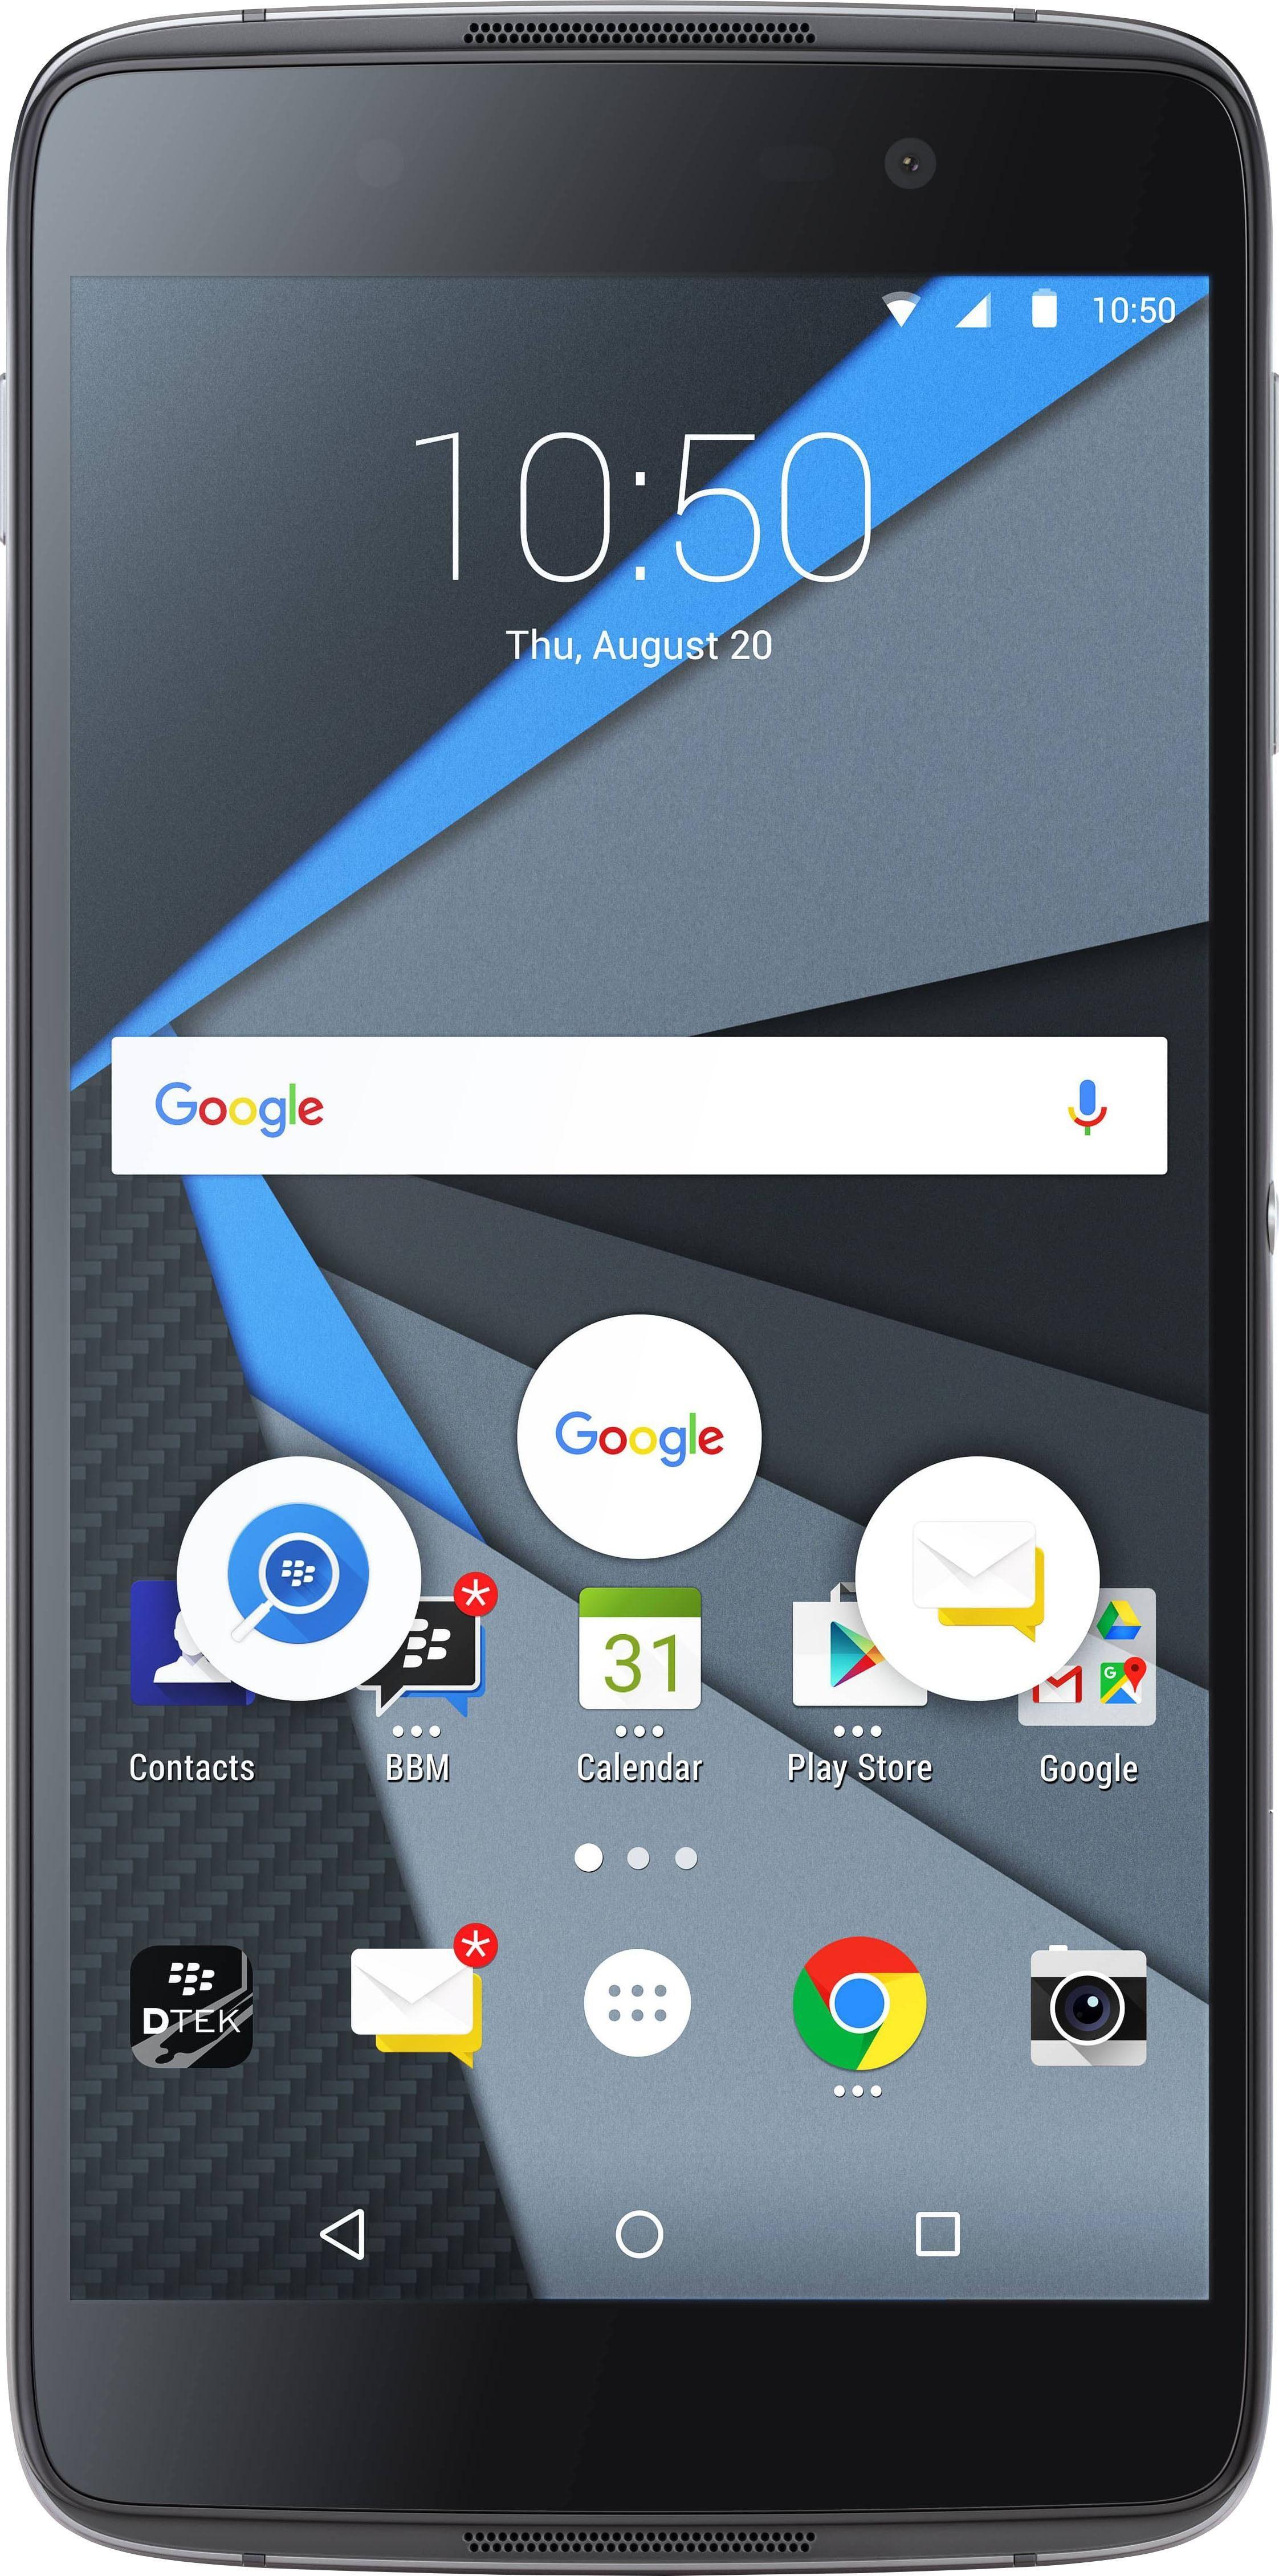 Blackberry DTEK 50 Smartphone, 13,2 cm (5,2 Zoll) Display, LTE (4G), Android 6.0 (Marshmallow)